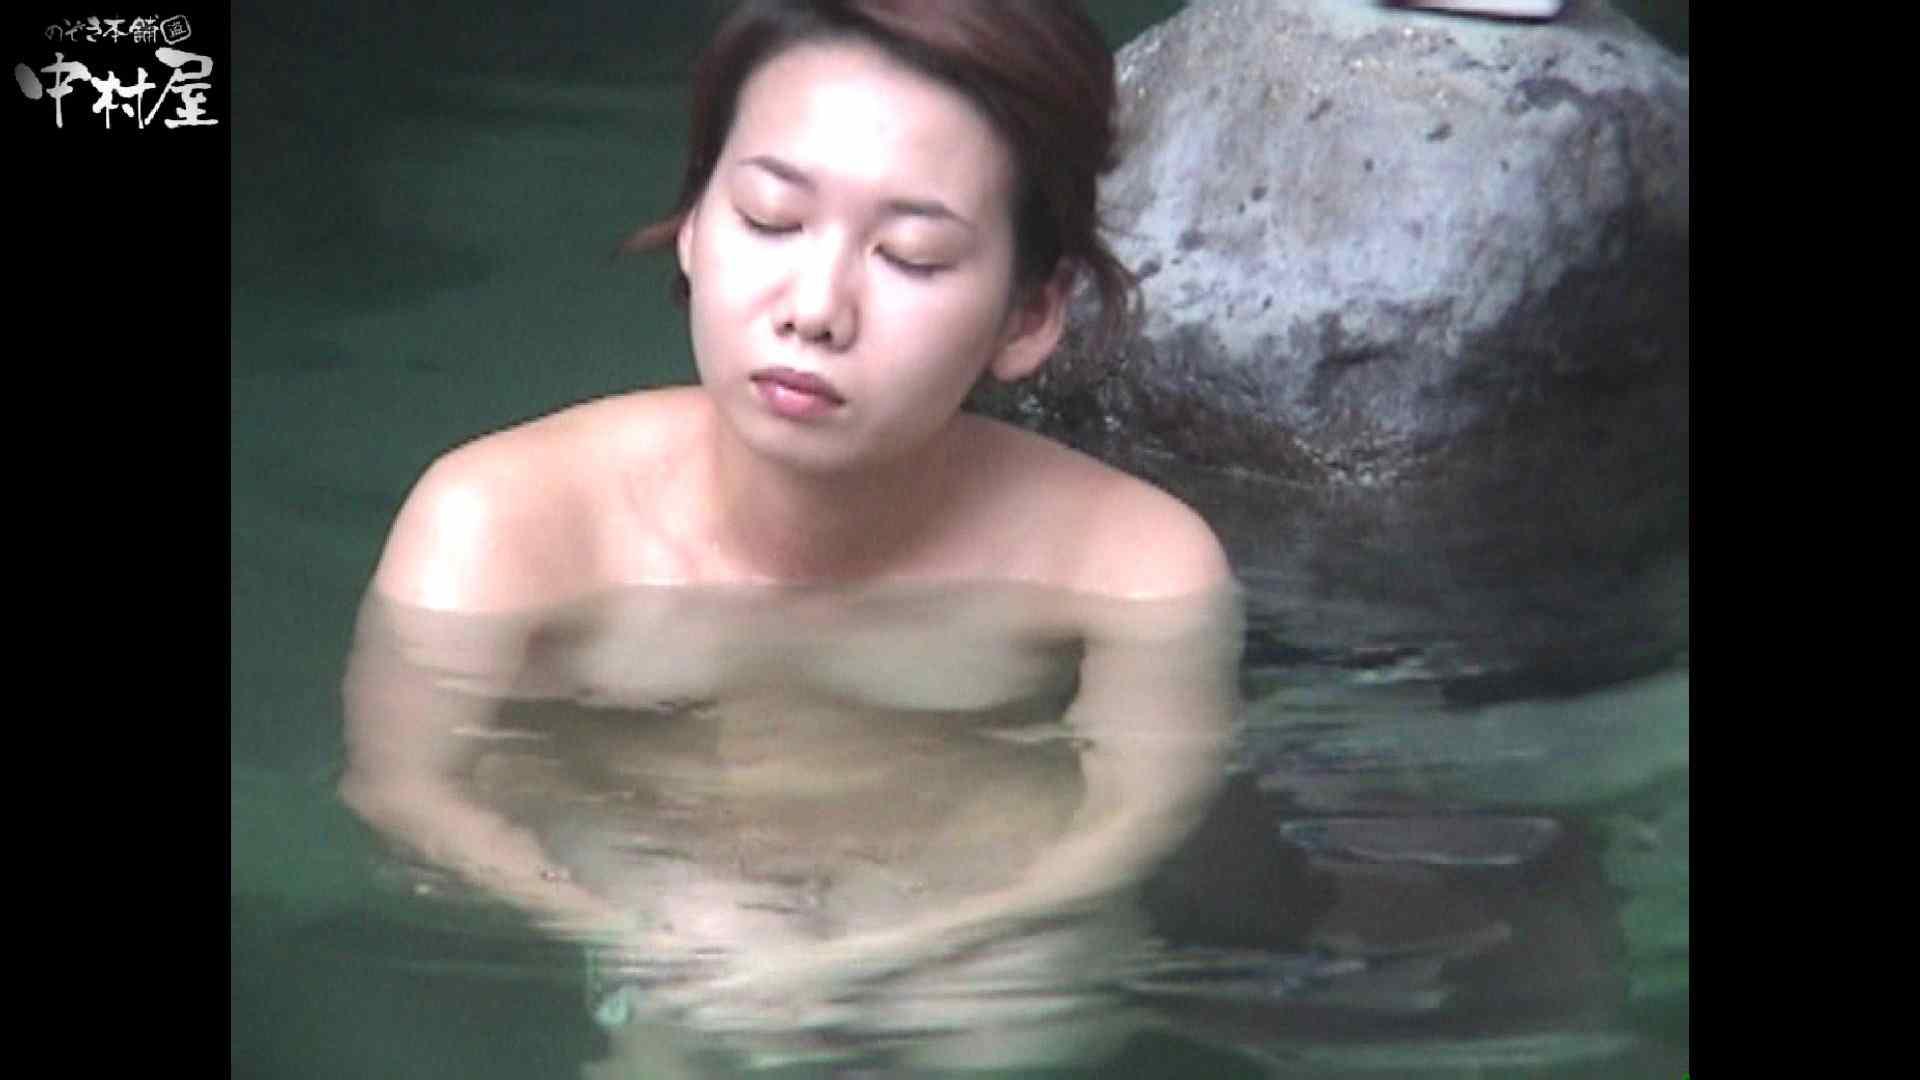 Aquaな露天風呂Vol.951 盗撮映像  93Pix 45